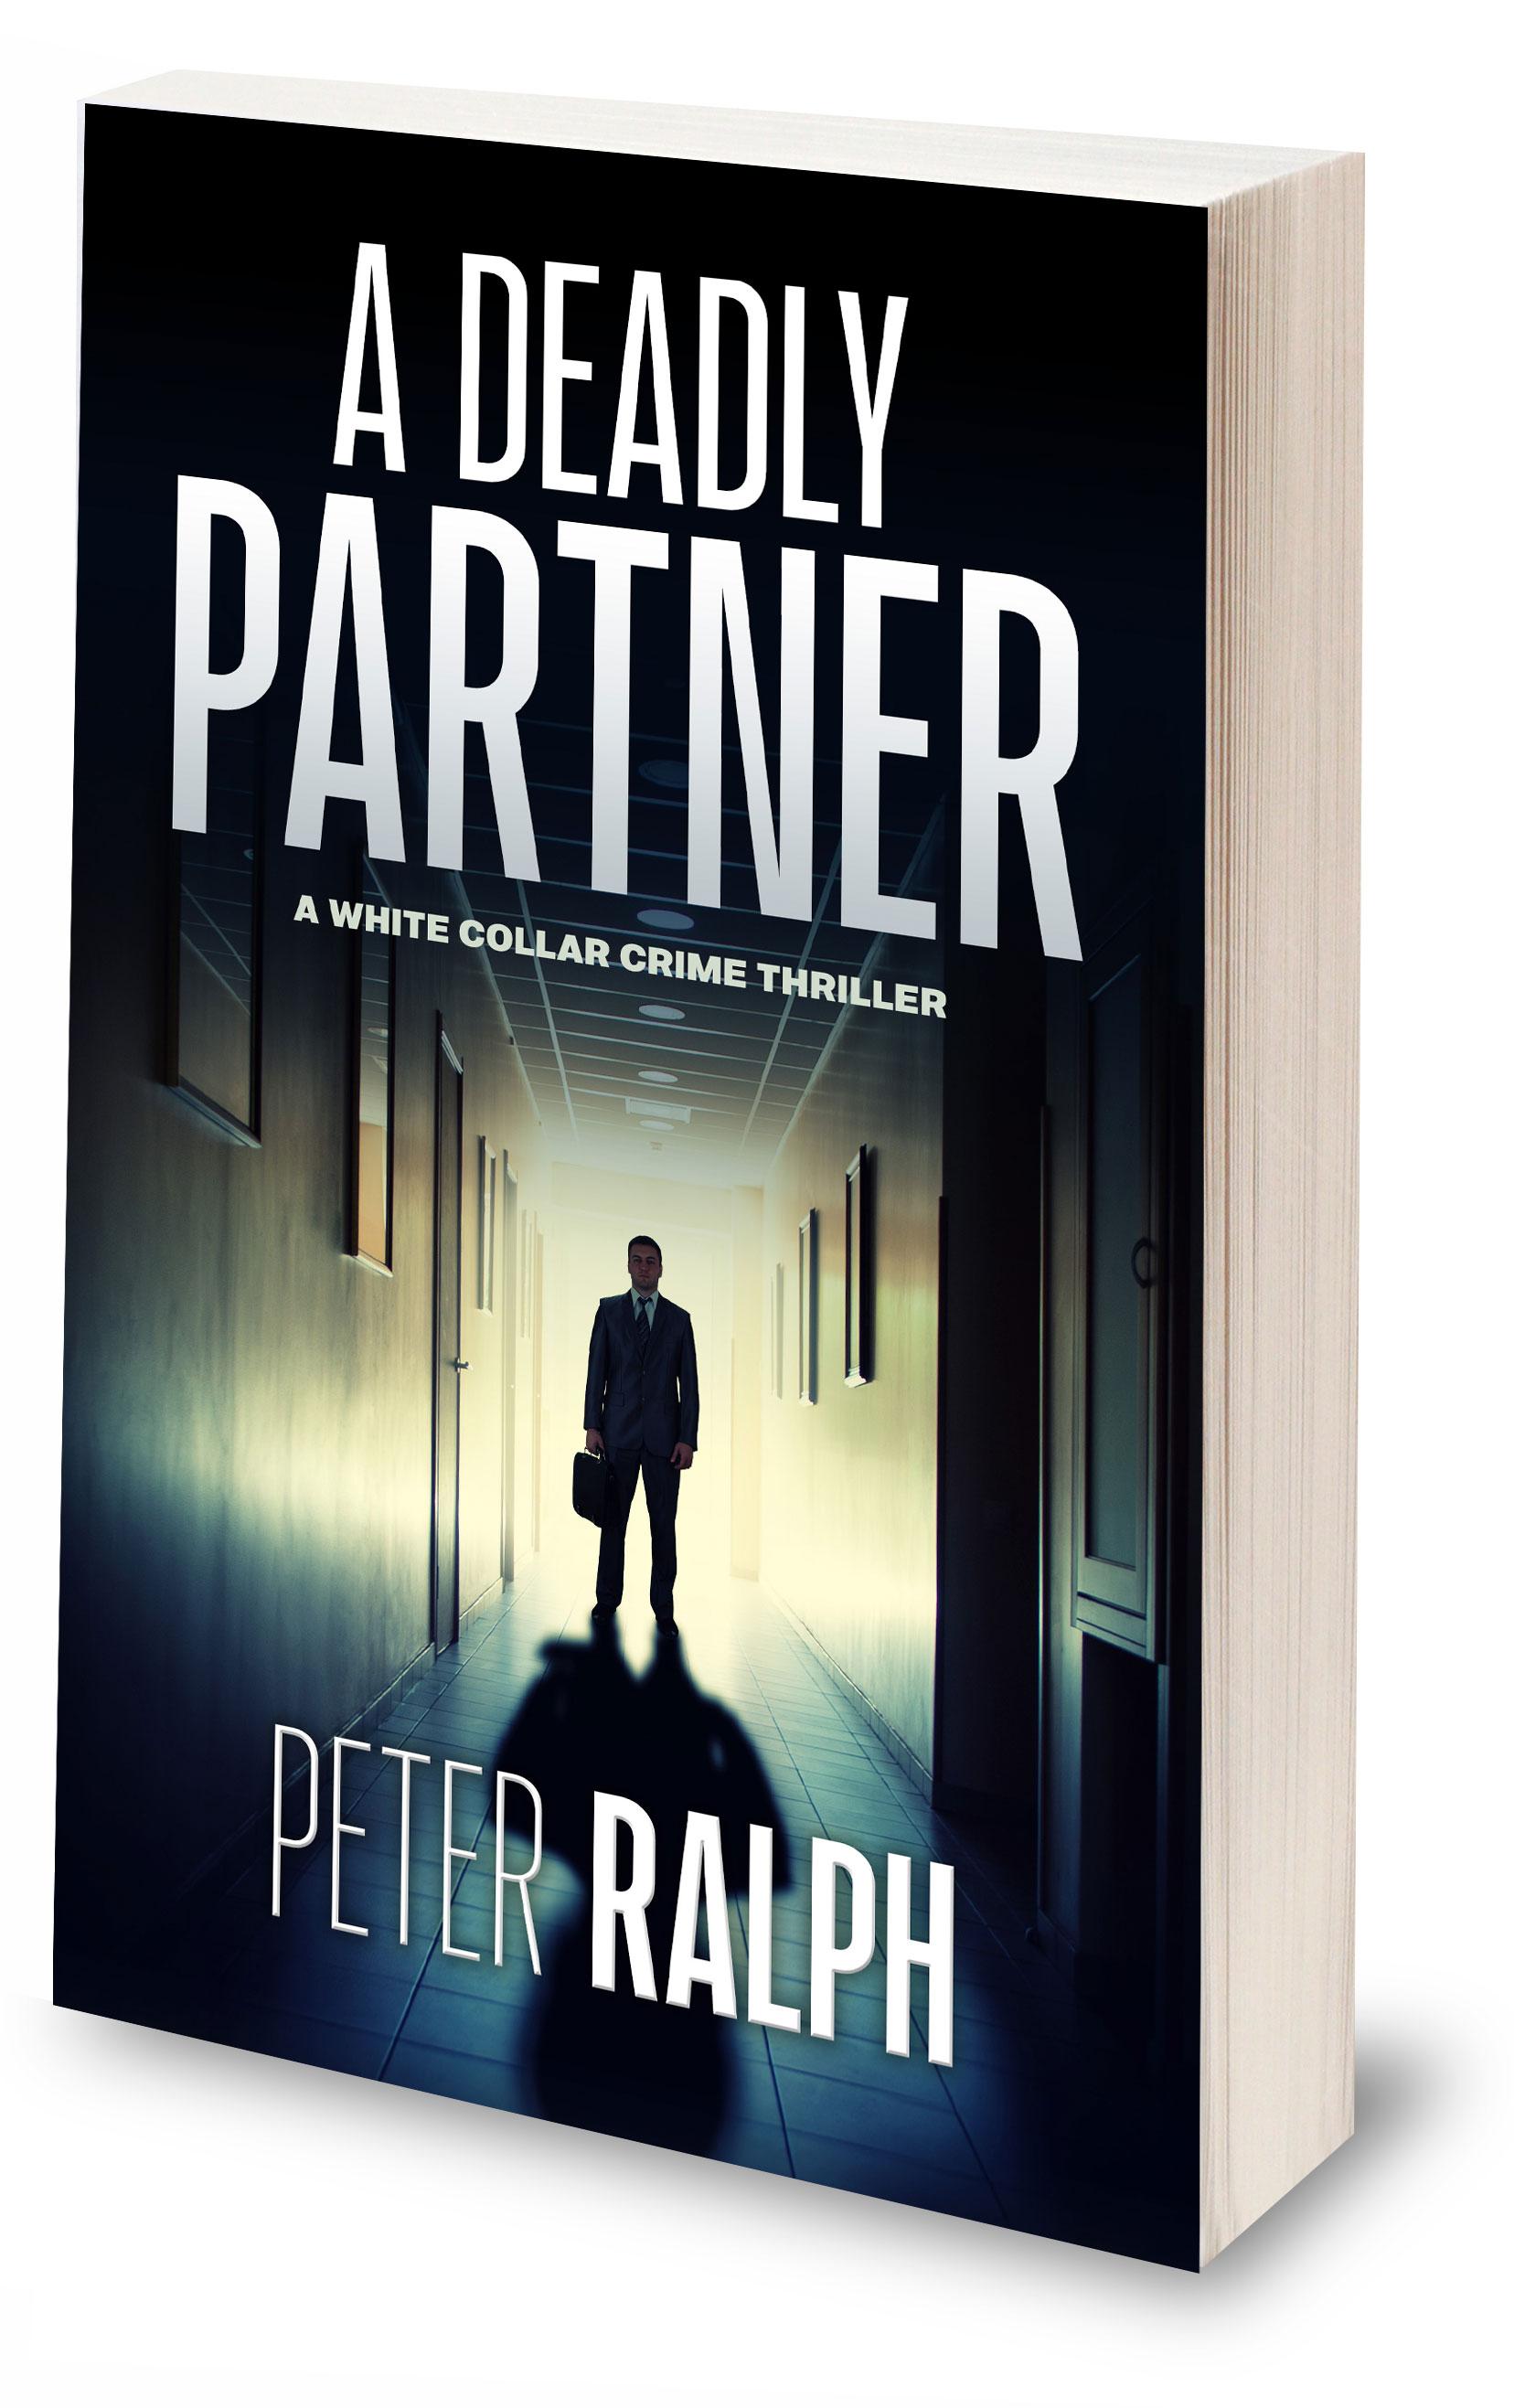 A-Deadly-Partner_3D-cover.jpg